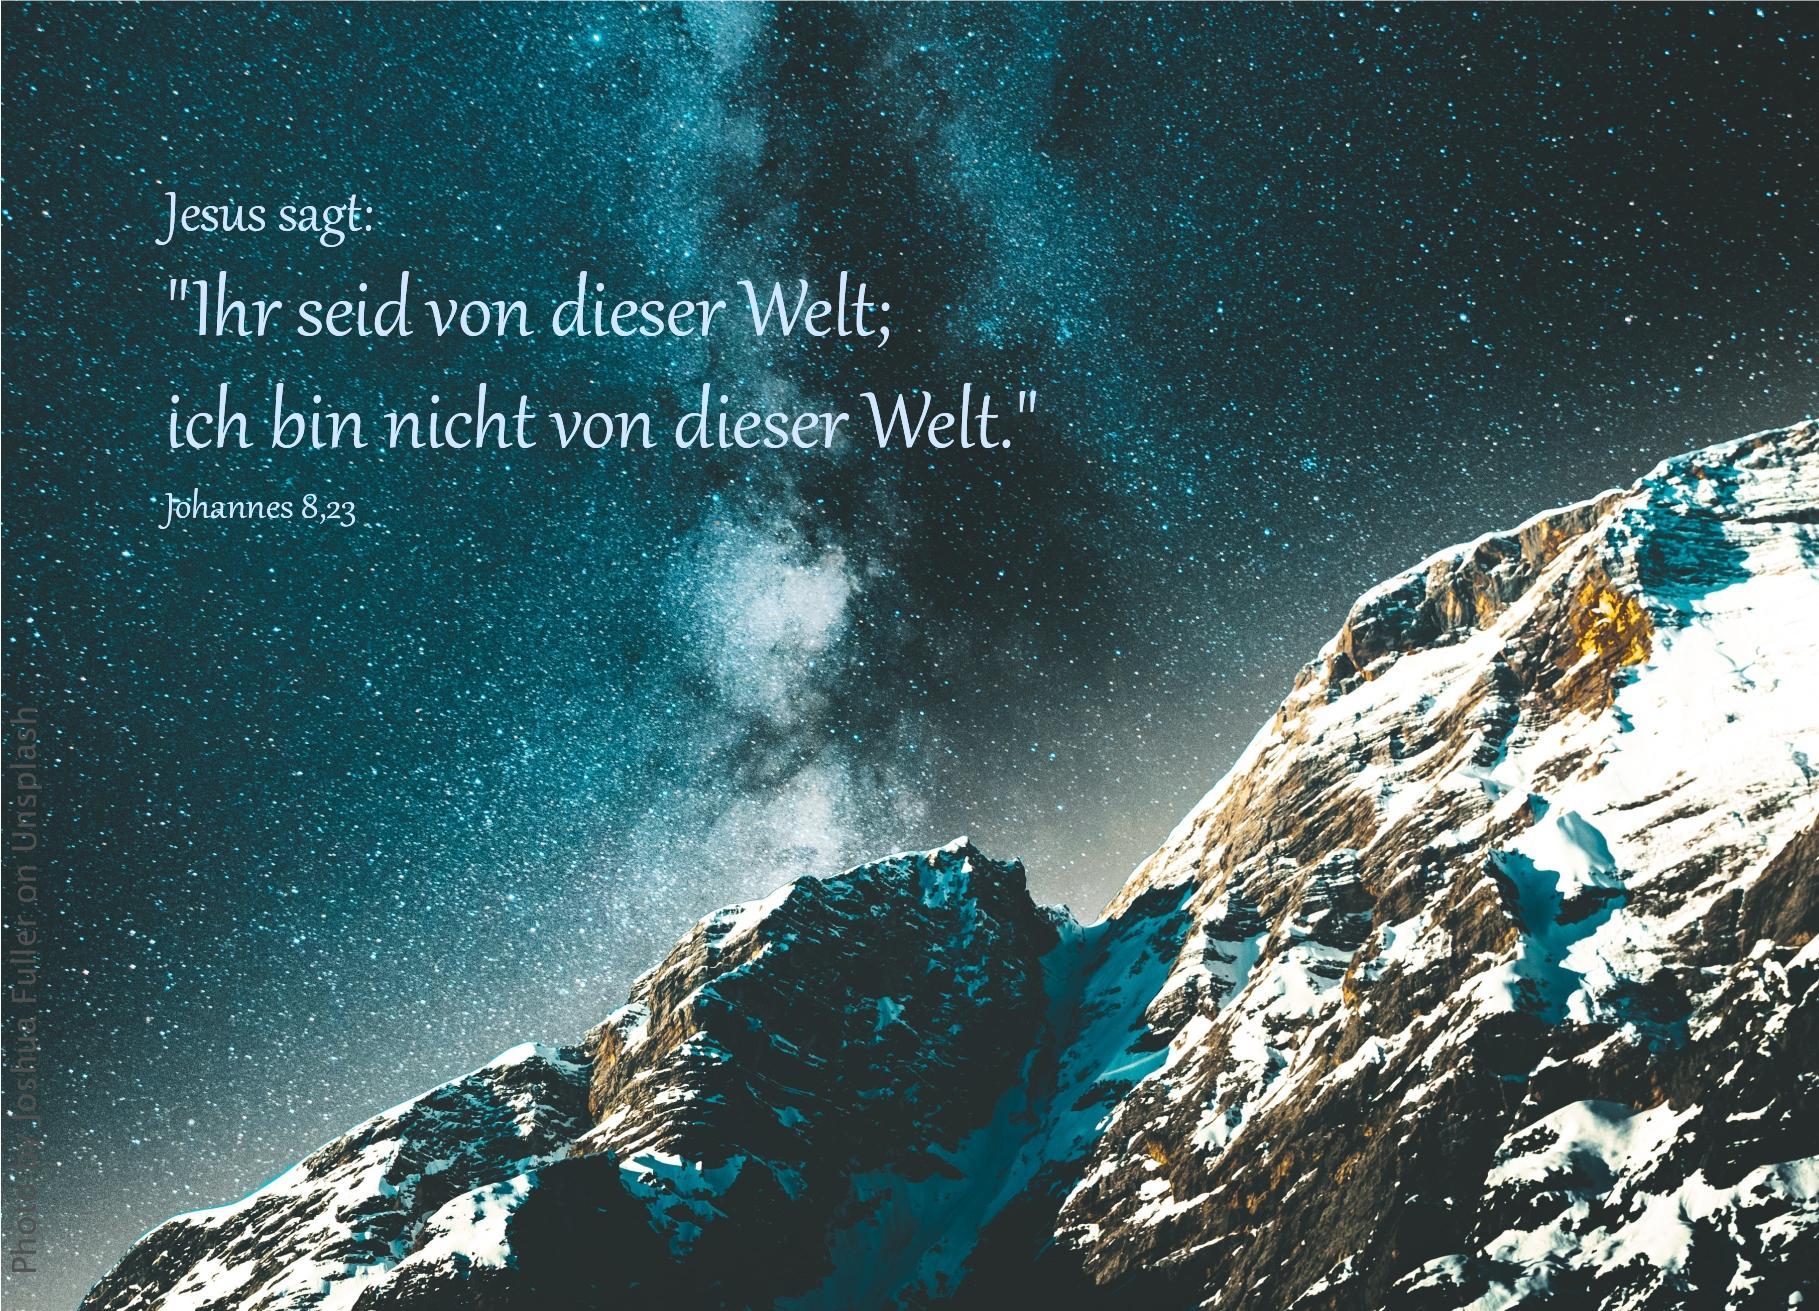 "alt=""felsen_berg_vor_sternenhimmel_erwartet_bibelhoerbuch_jakob_und_esau"""